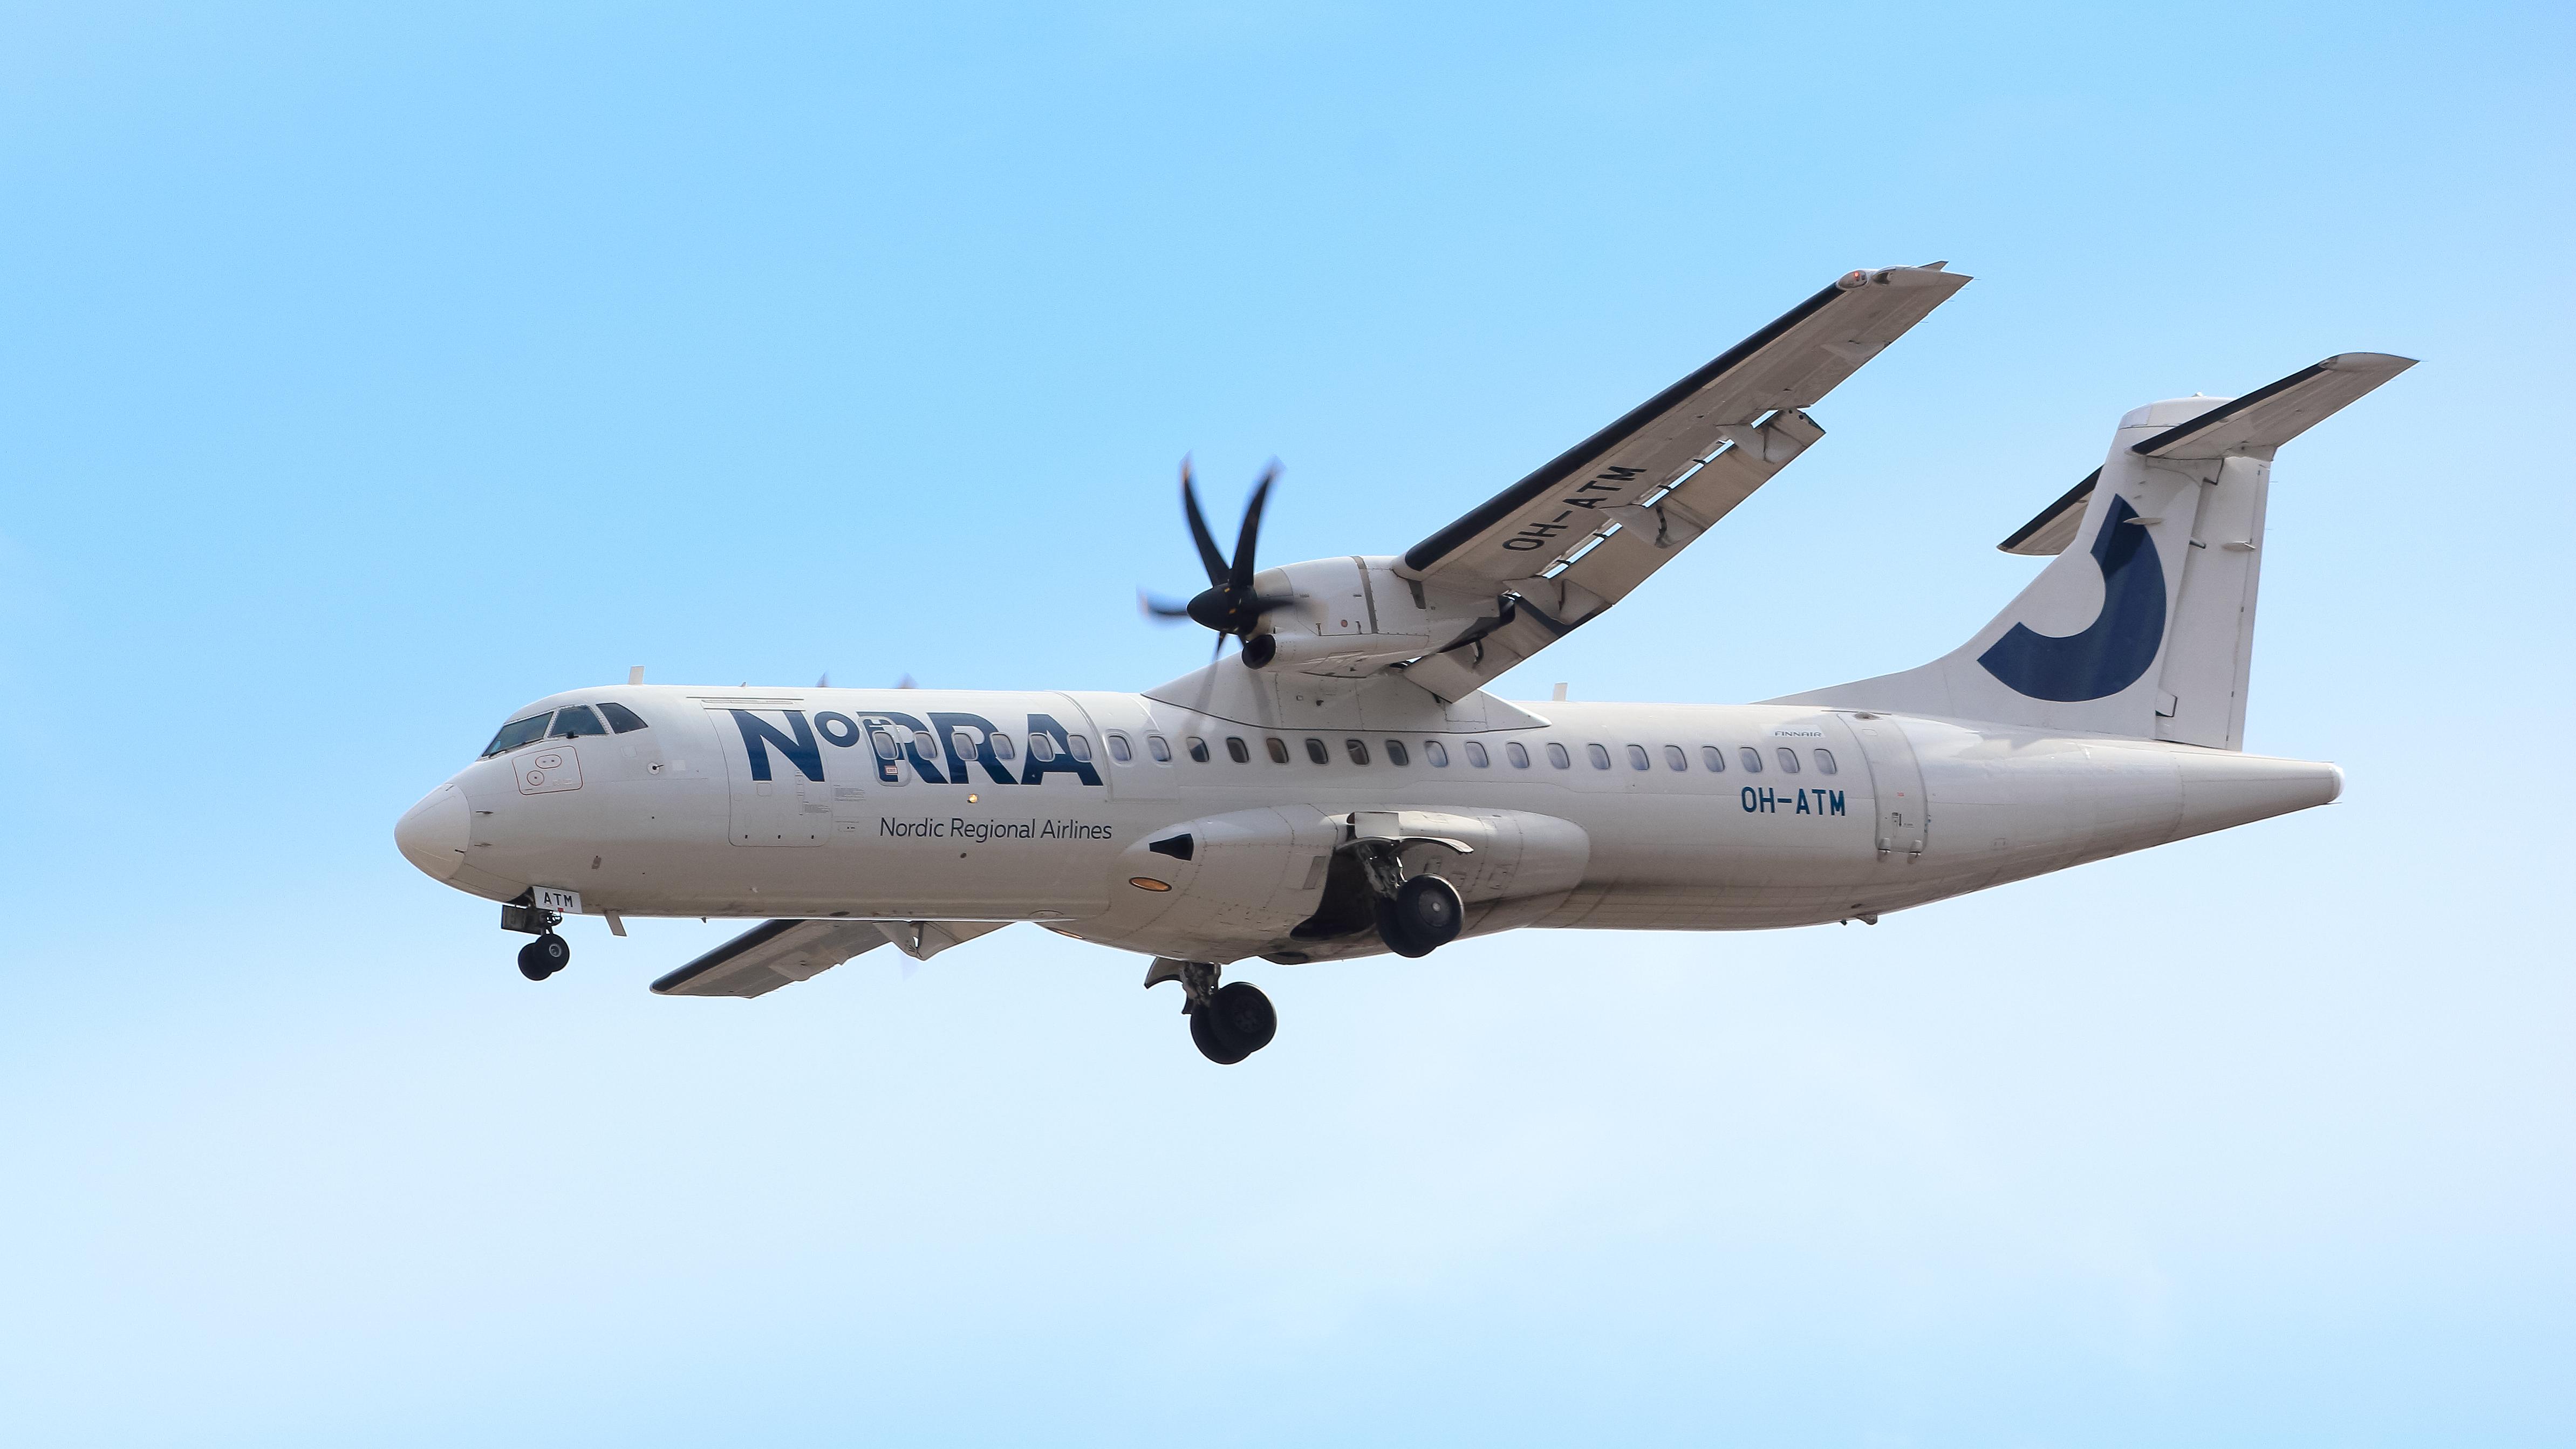 En ATR72 fra det regionale finske flyselskab Norra. Foto: Valentin Hintikka